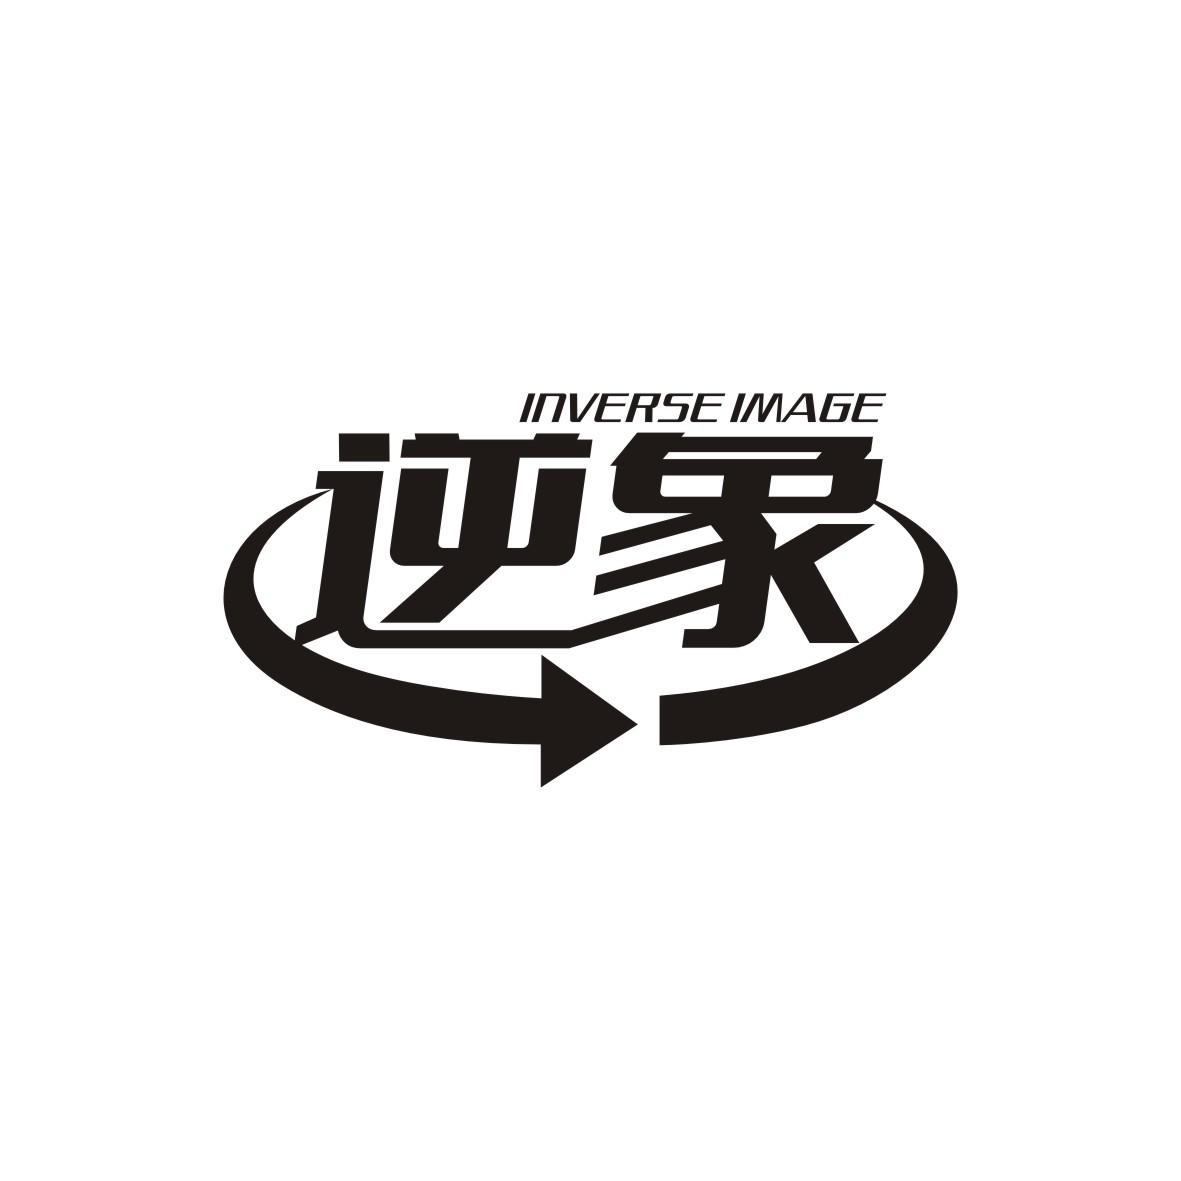 逆象 INVERSE IMAGE